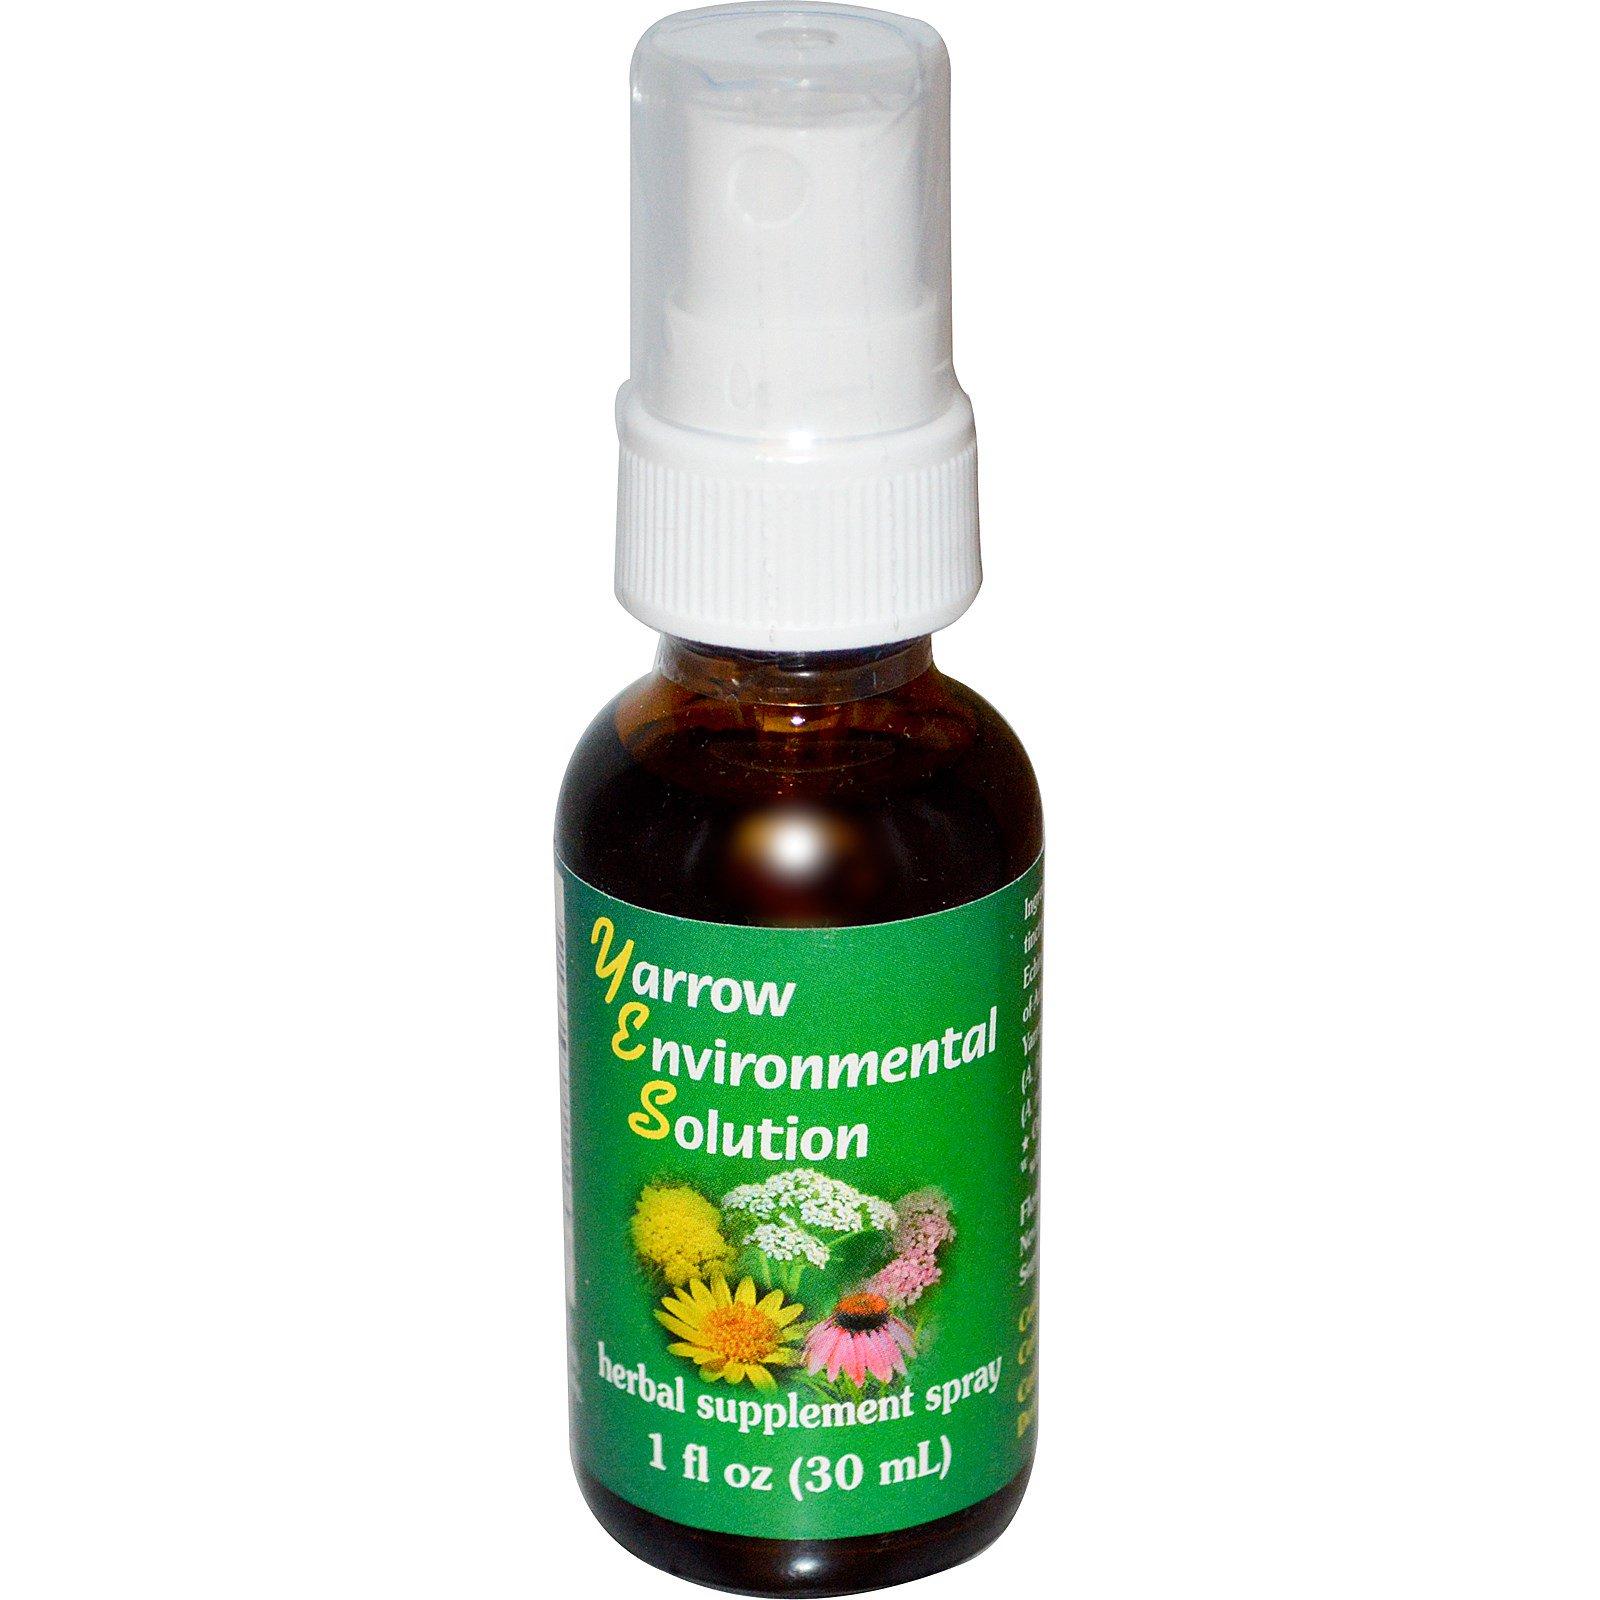 Flower Essence Services Yarrow Environmental Solution Spray 1 Fl